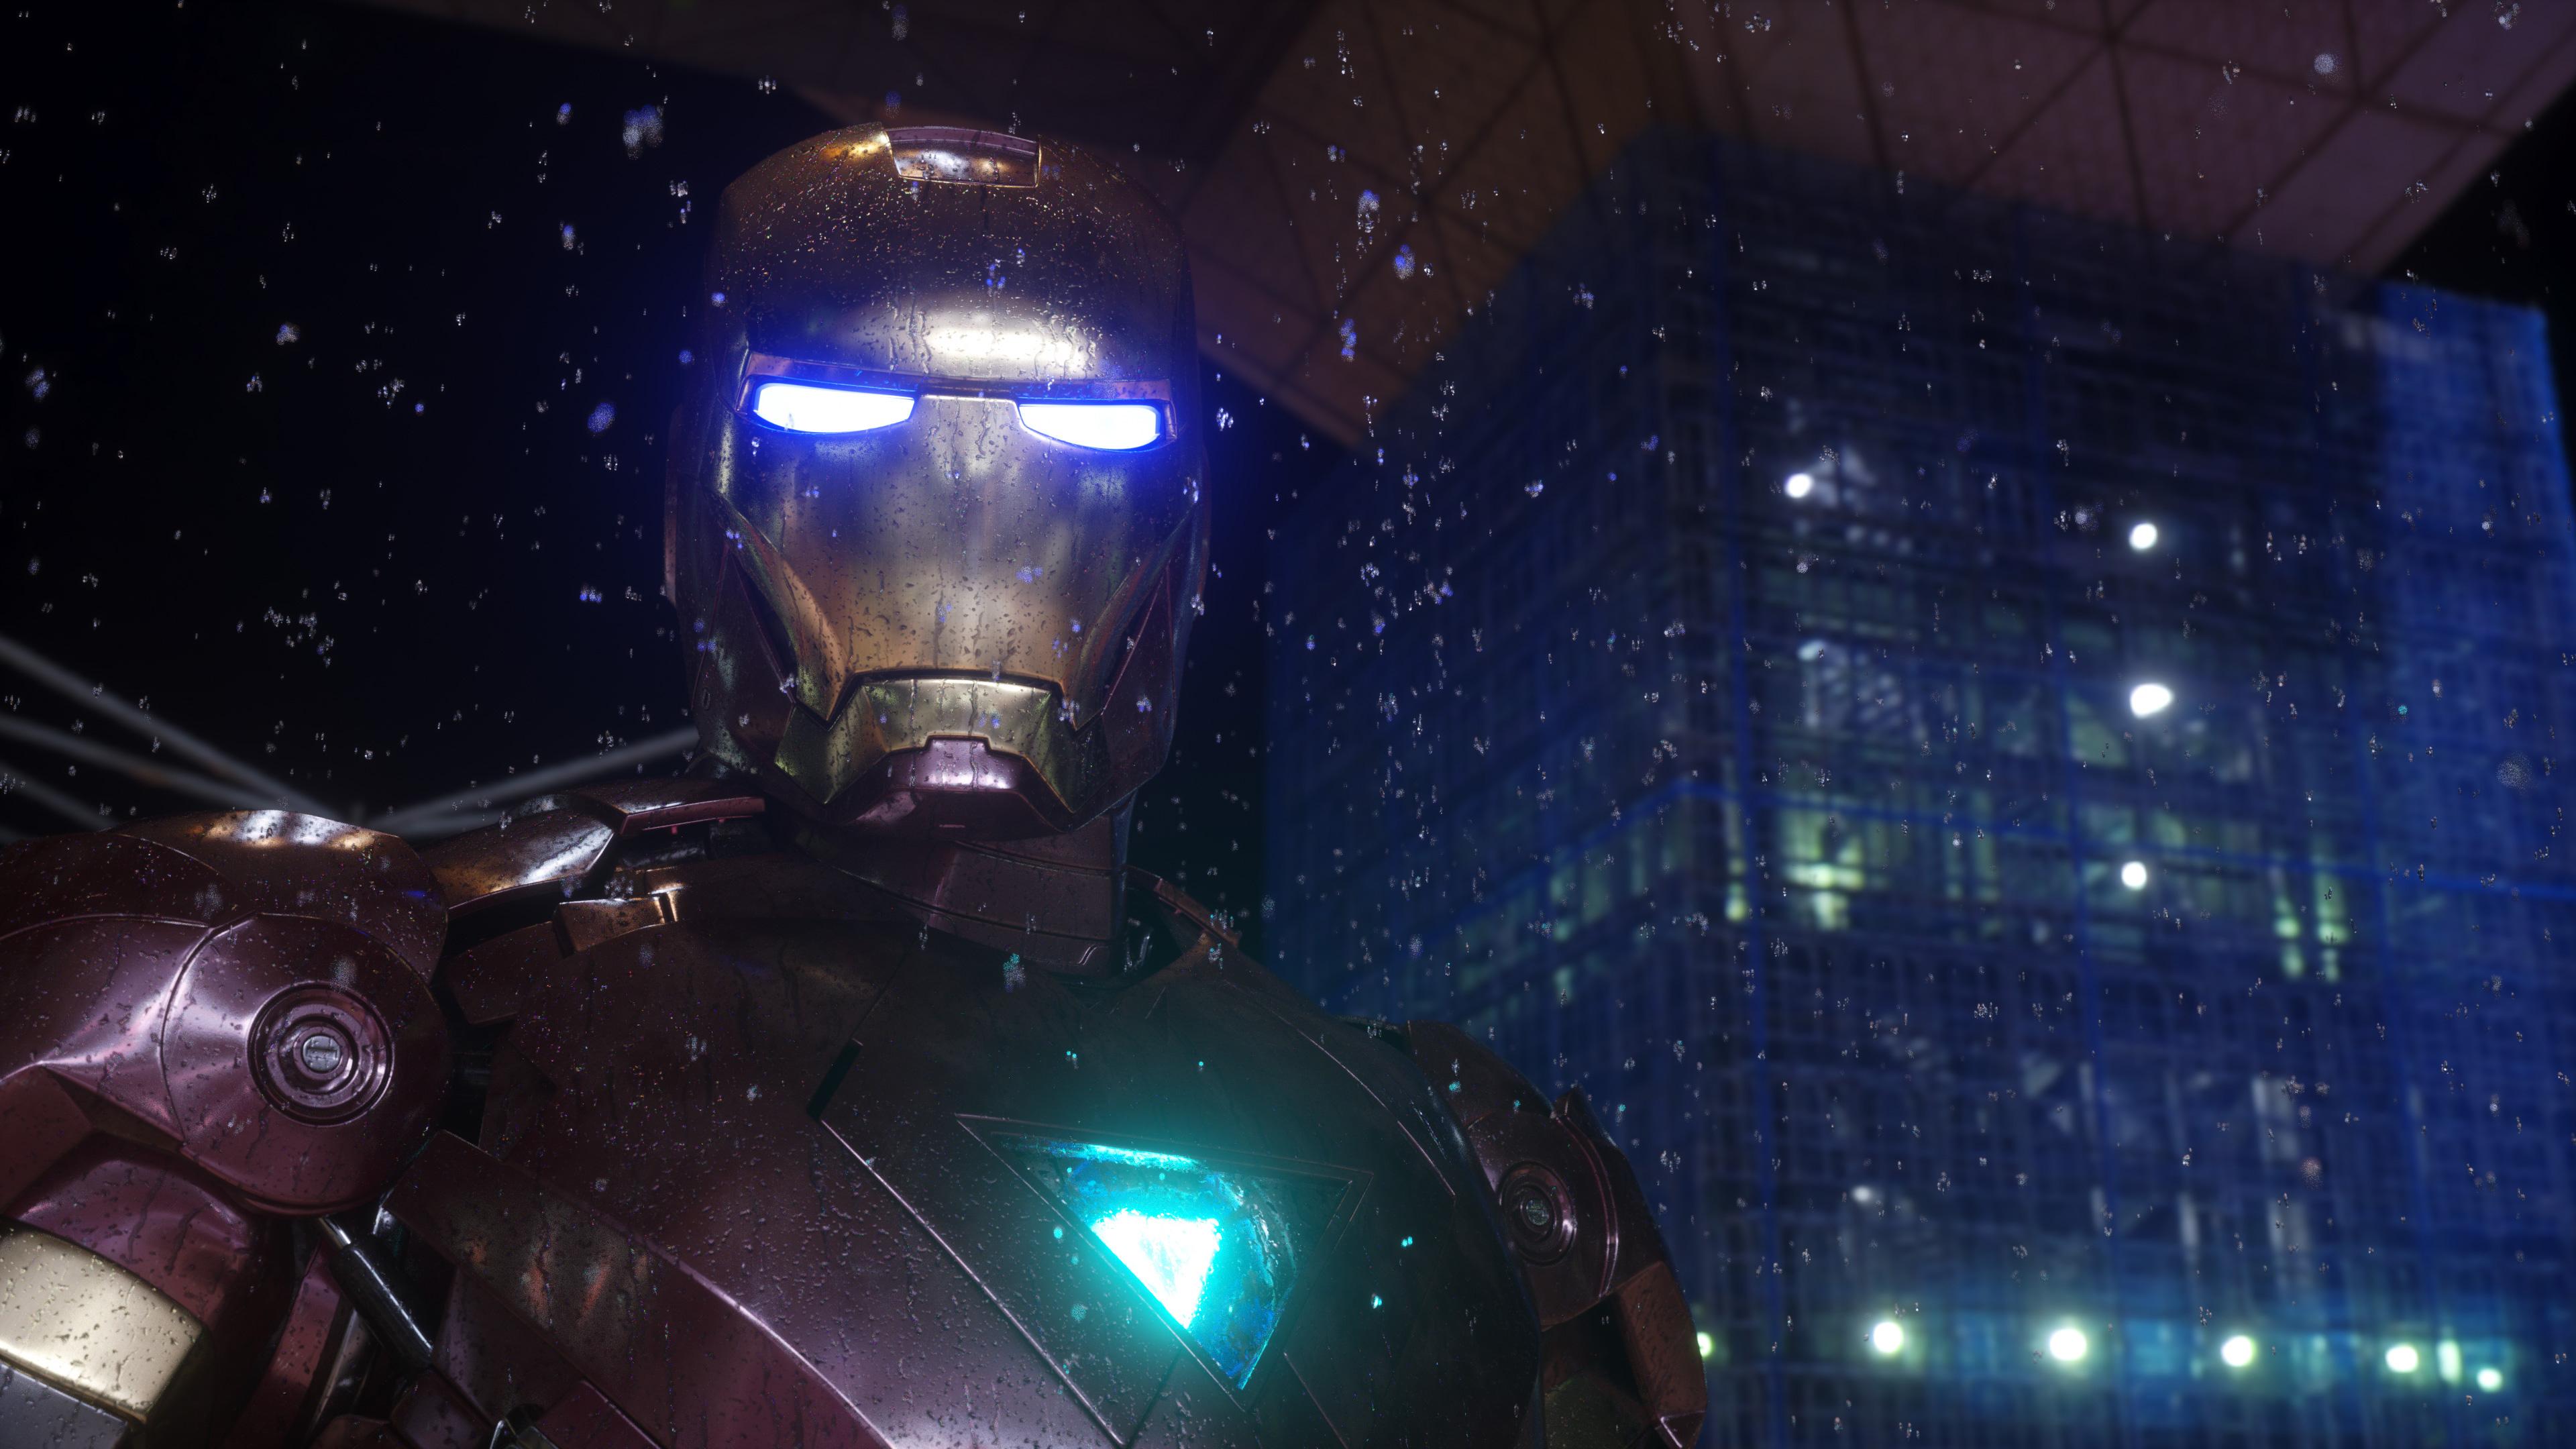 4k iron man 1537645936 - 4K Iron Man - superheroes wallpapers, iron man wallpapers, hd-wallpapers, behance wallpapers, 4k-wallpapers